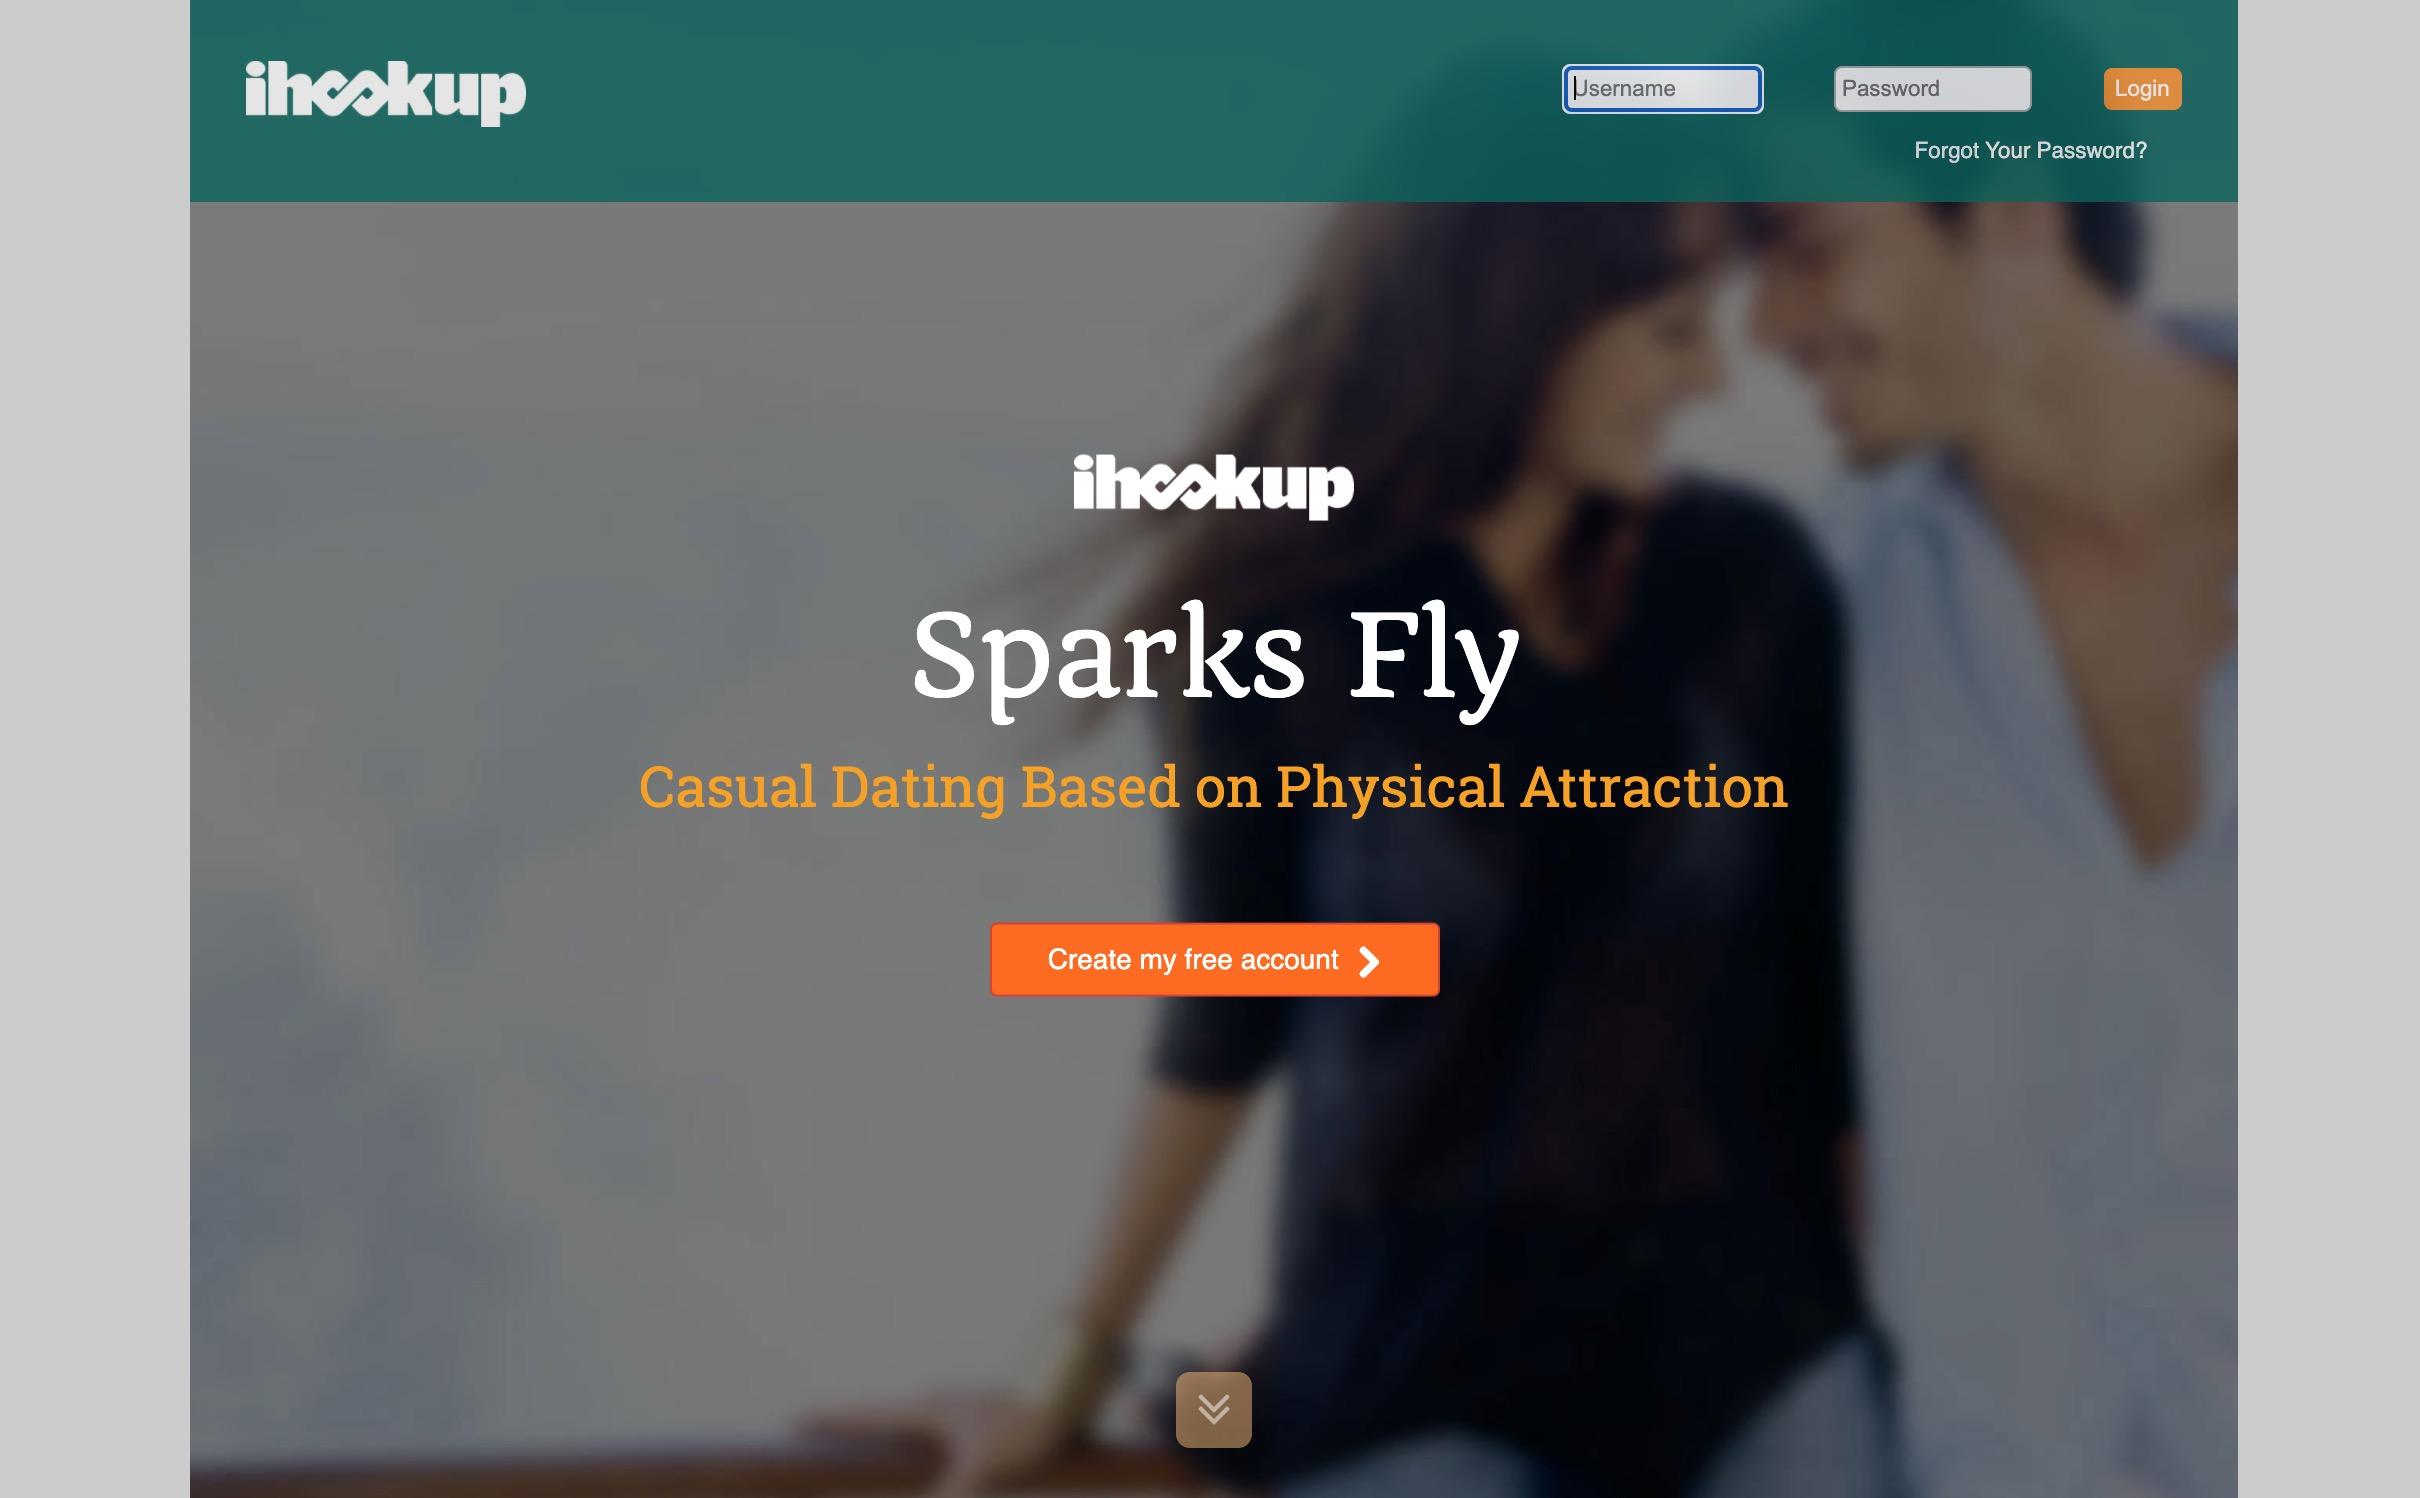 iHookup main page